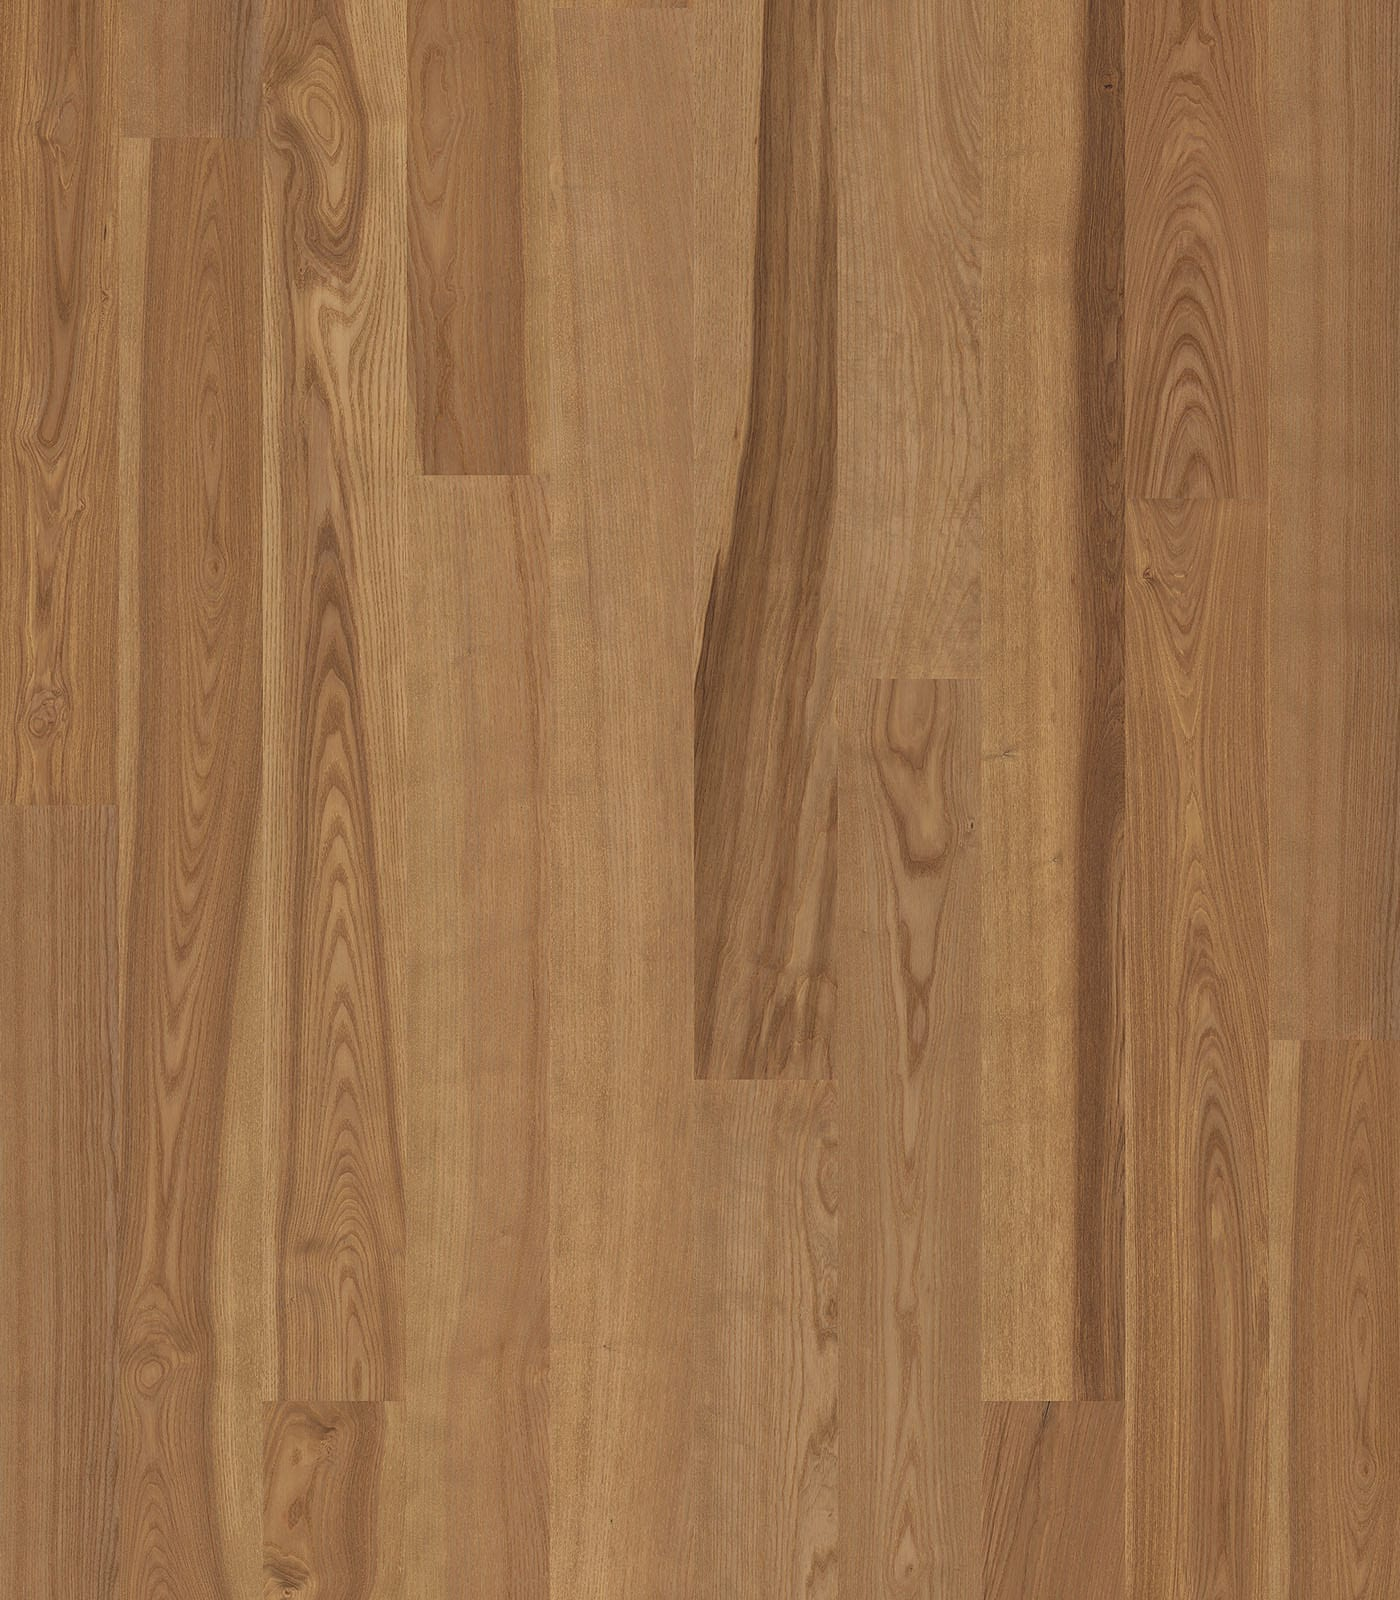 St Petersburg-After Oak Collection-European Ash floors - Flat